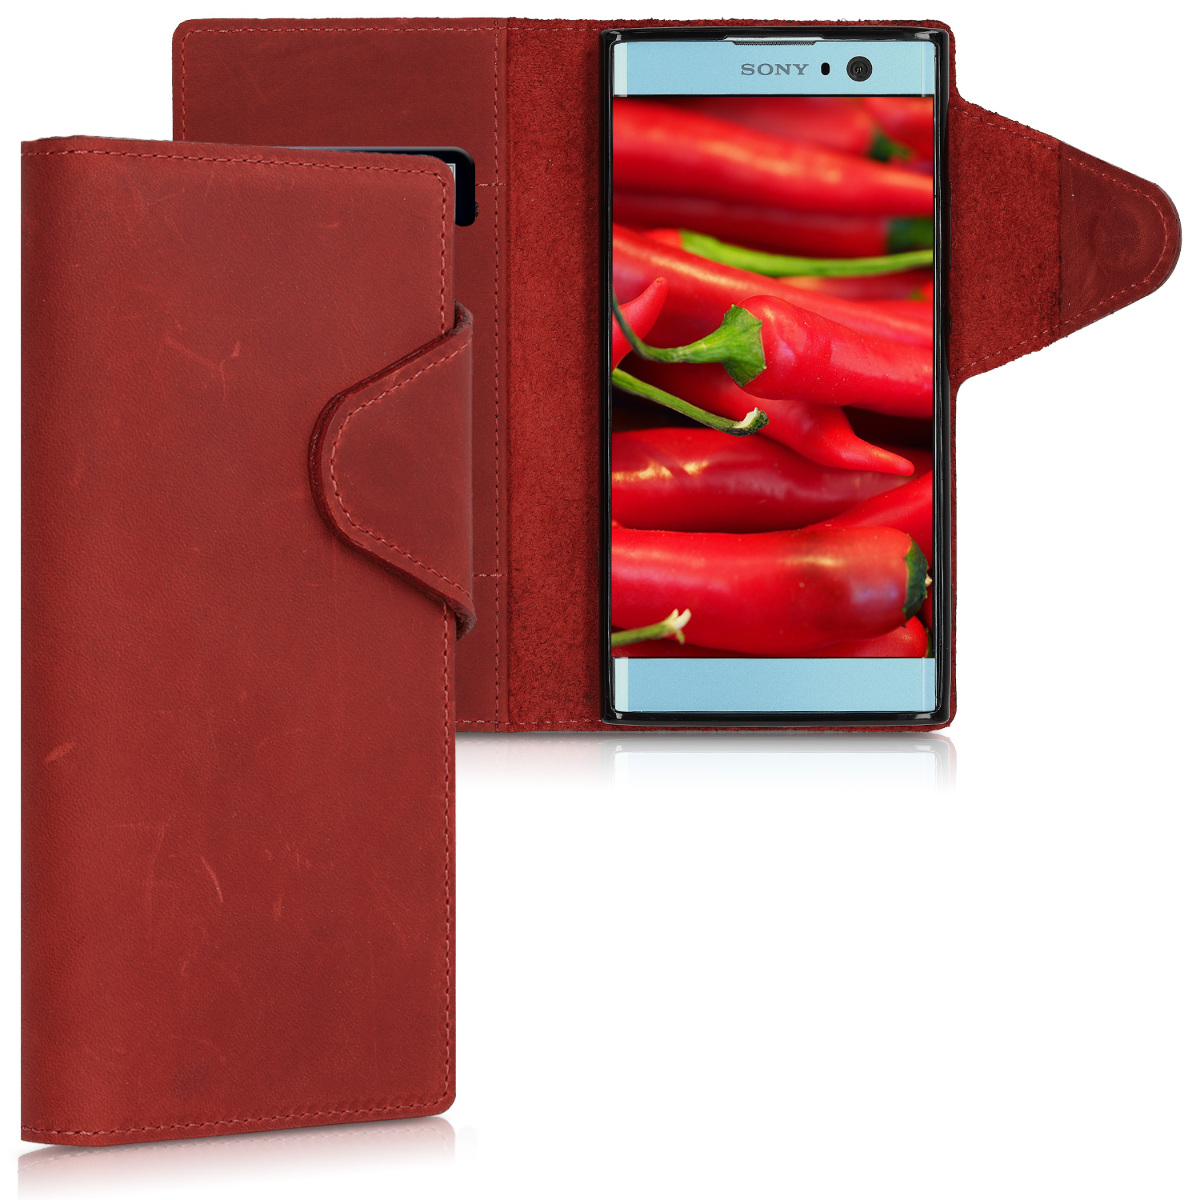 Kalibri Δερμάτινη Suede Θήκη - Πορτοφόλι  Sony Xperia XA2 -  Dark Red (44292.20)